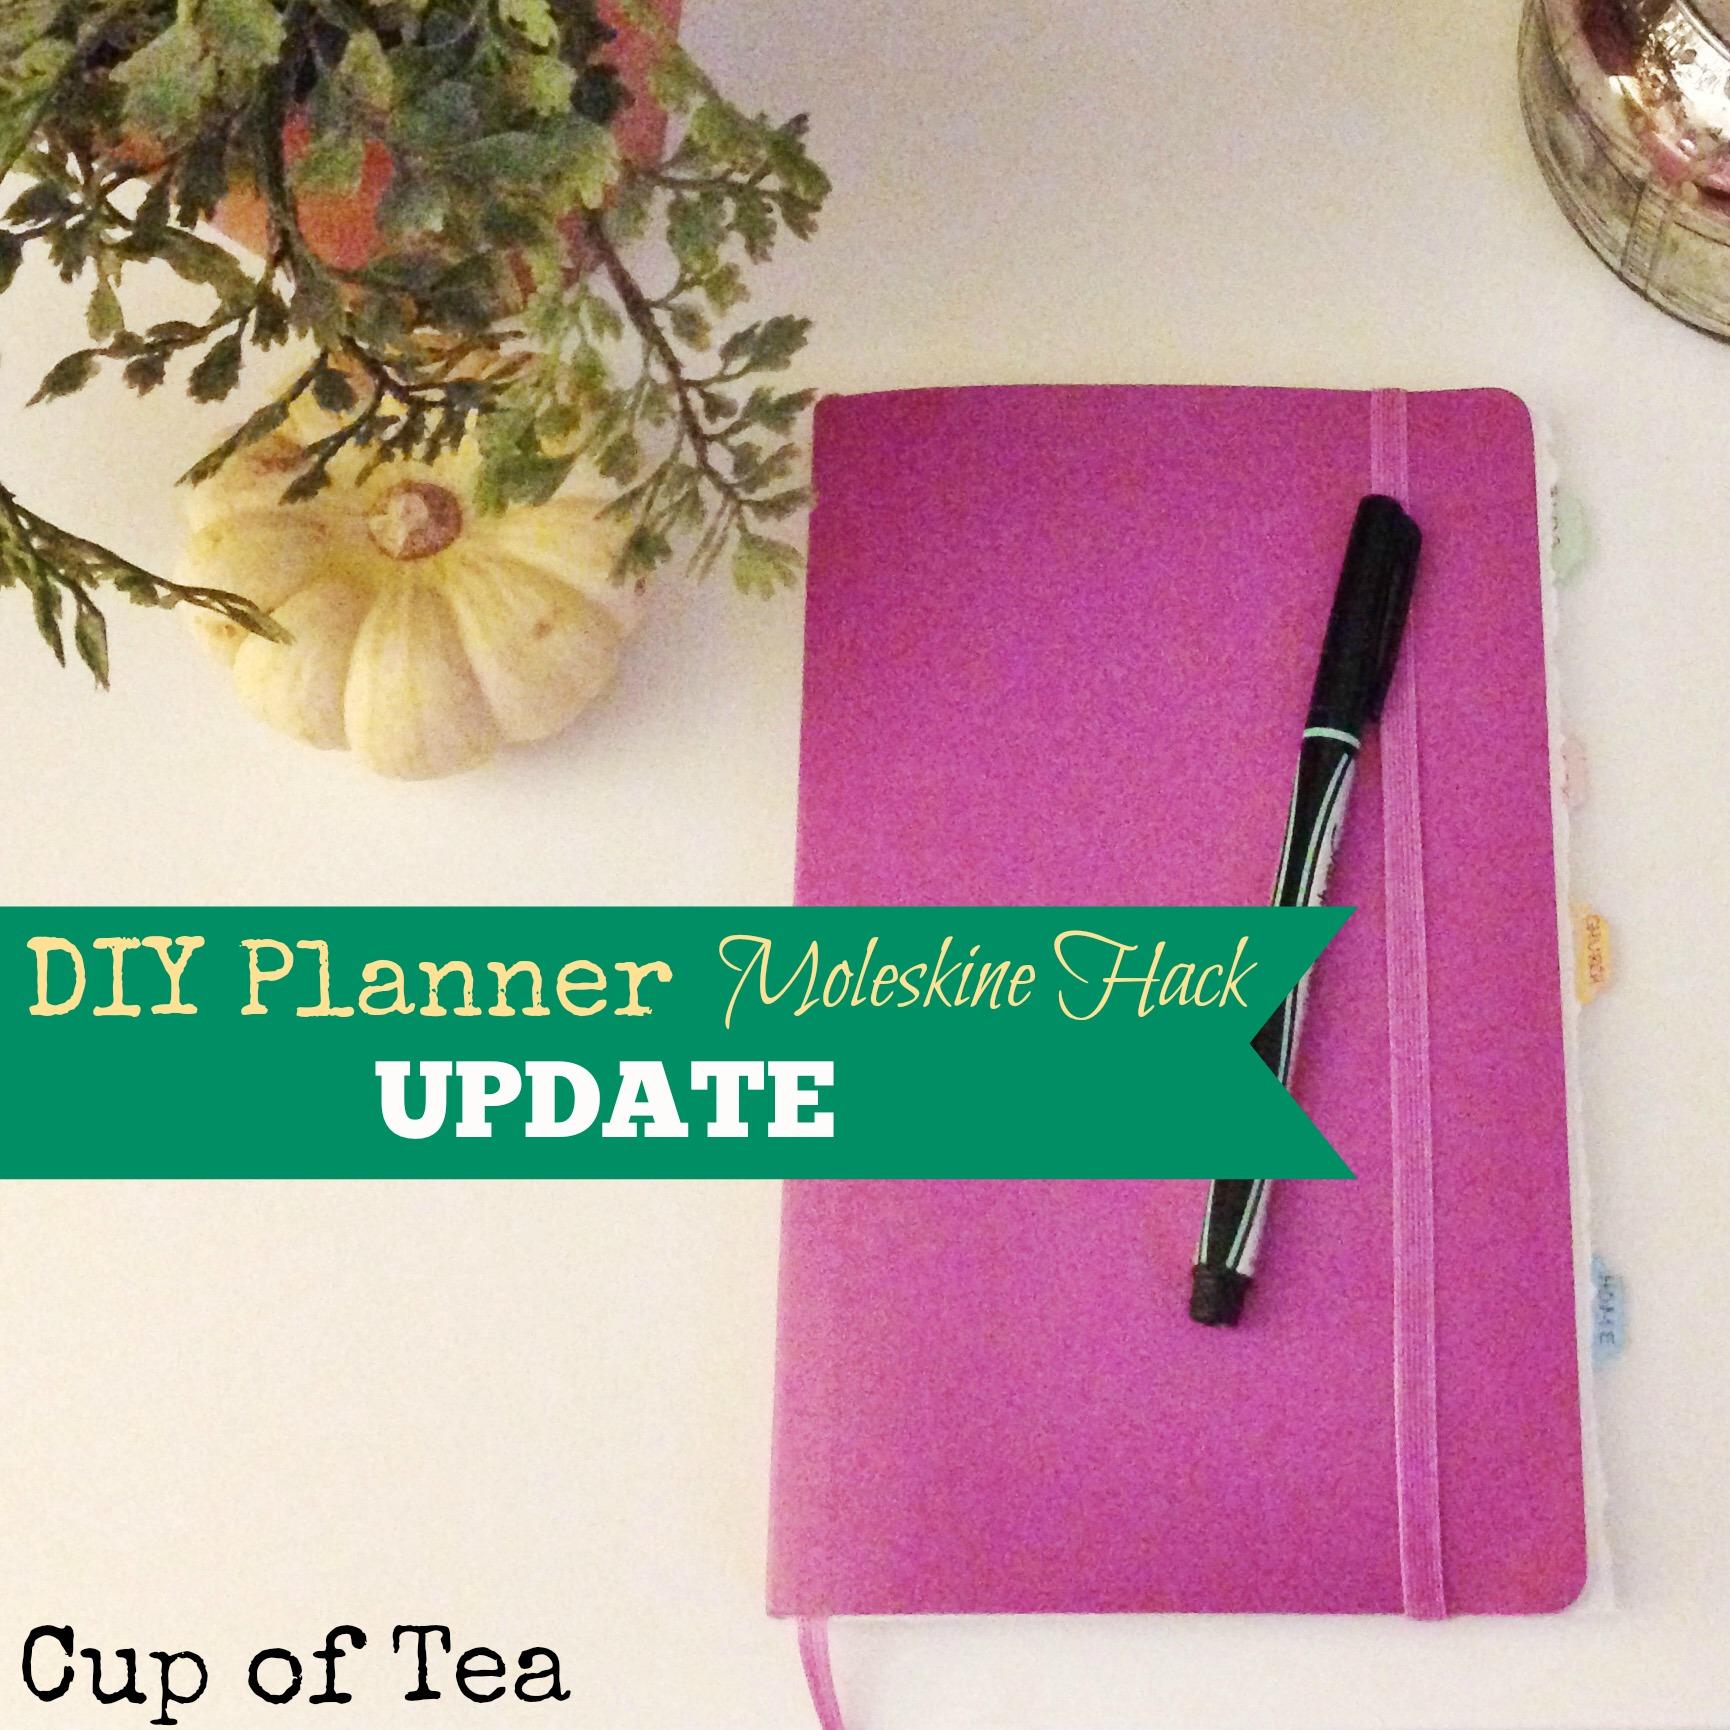 Moleskine Planner Update on Cup of Tea